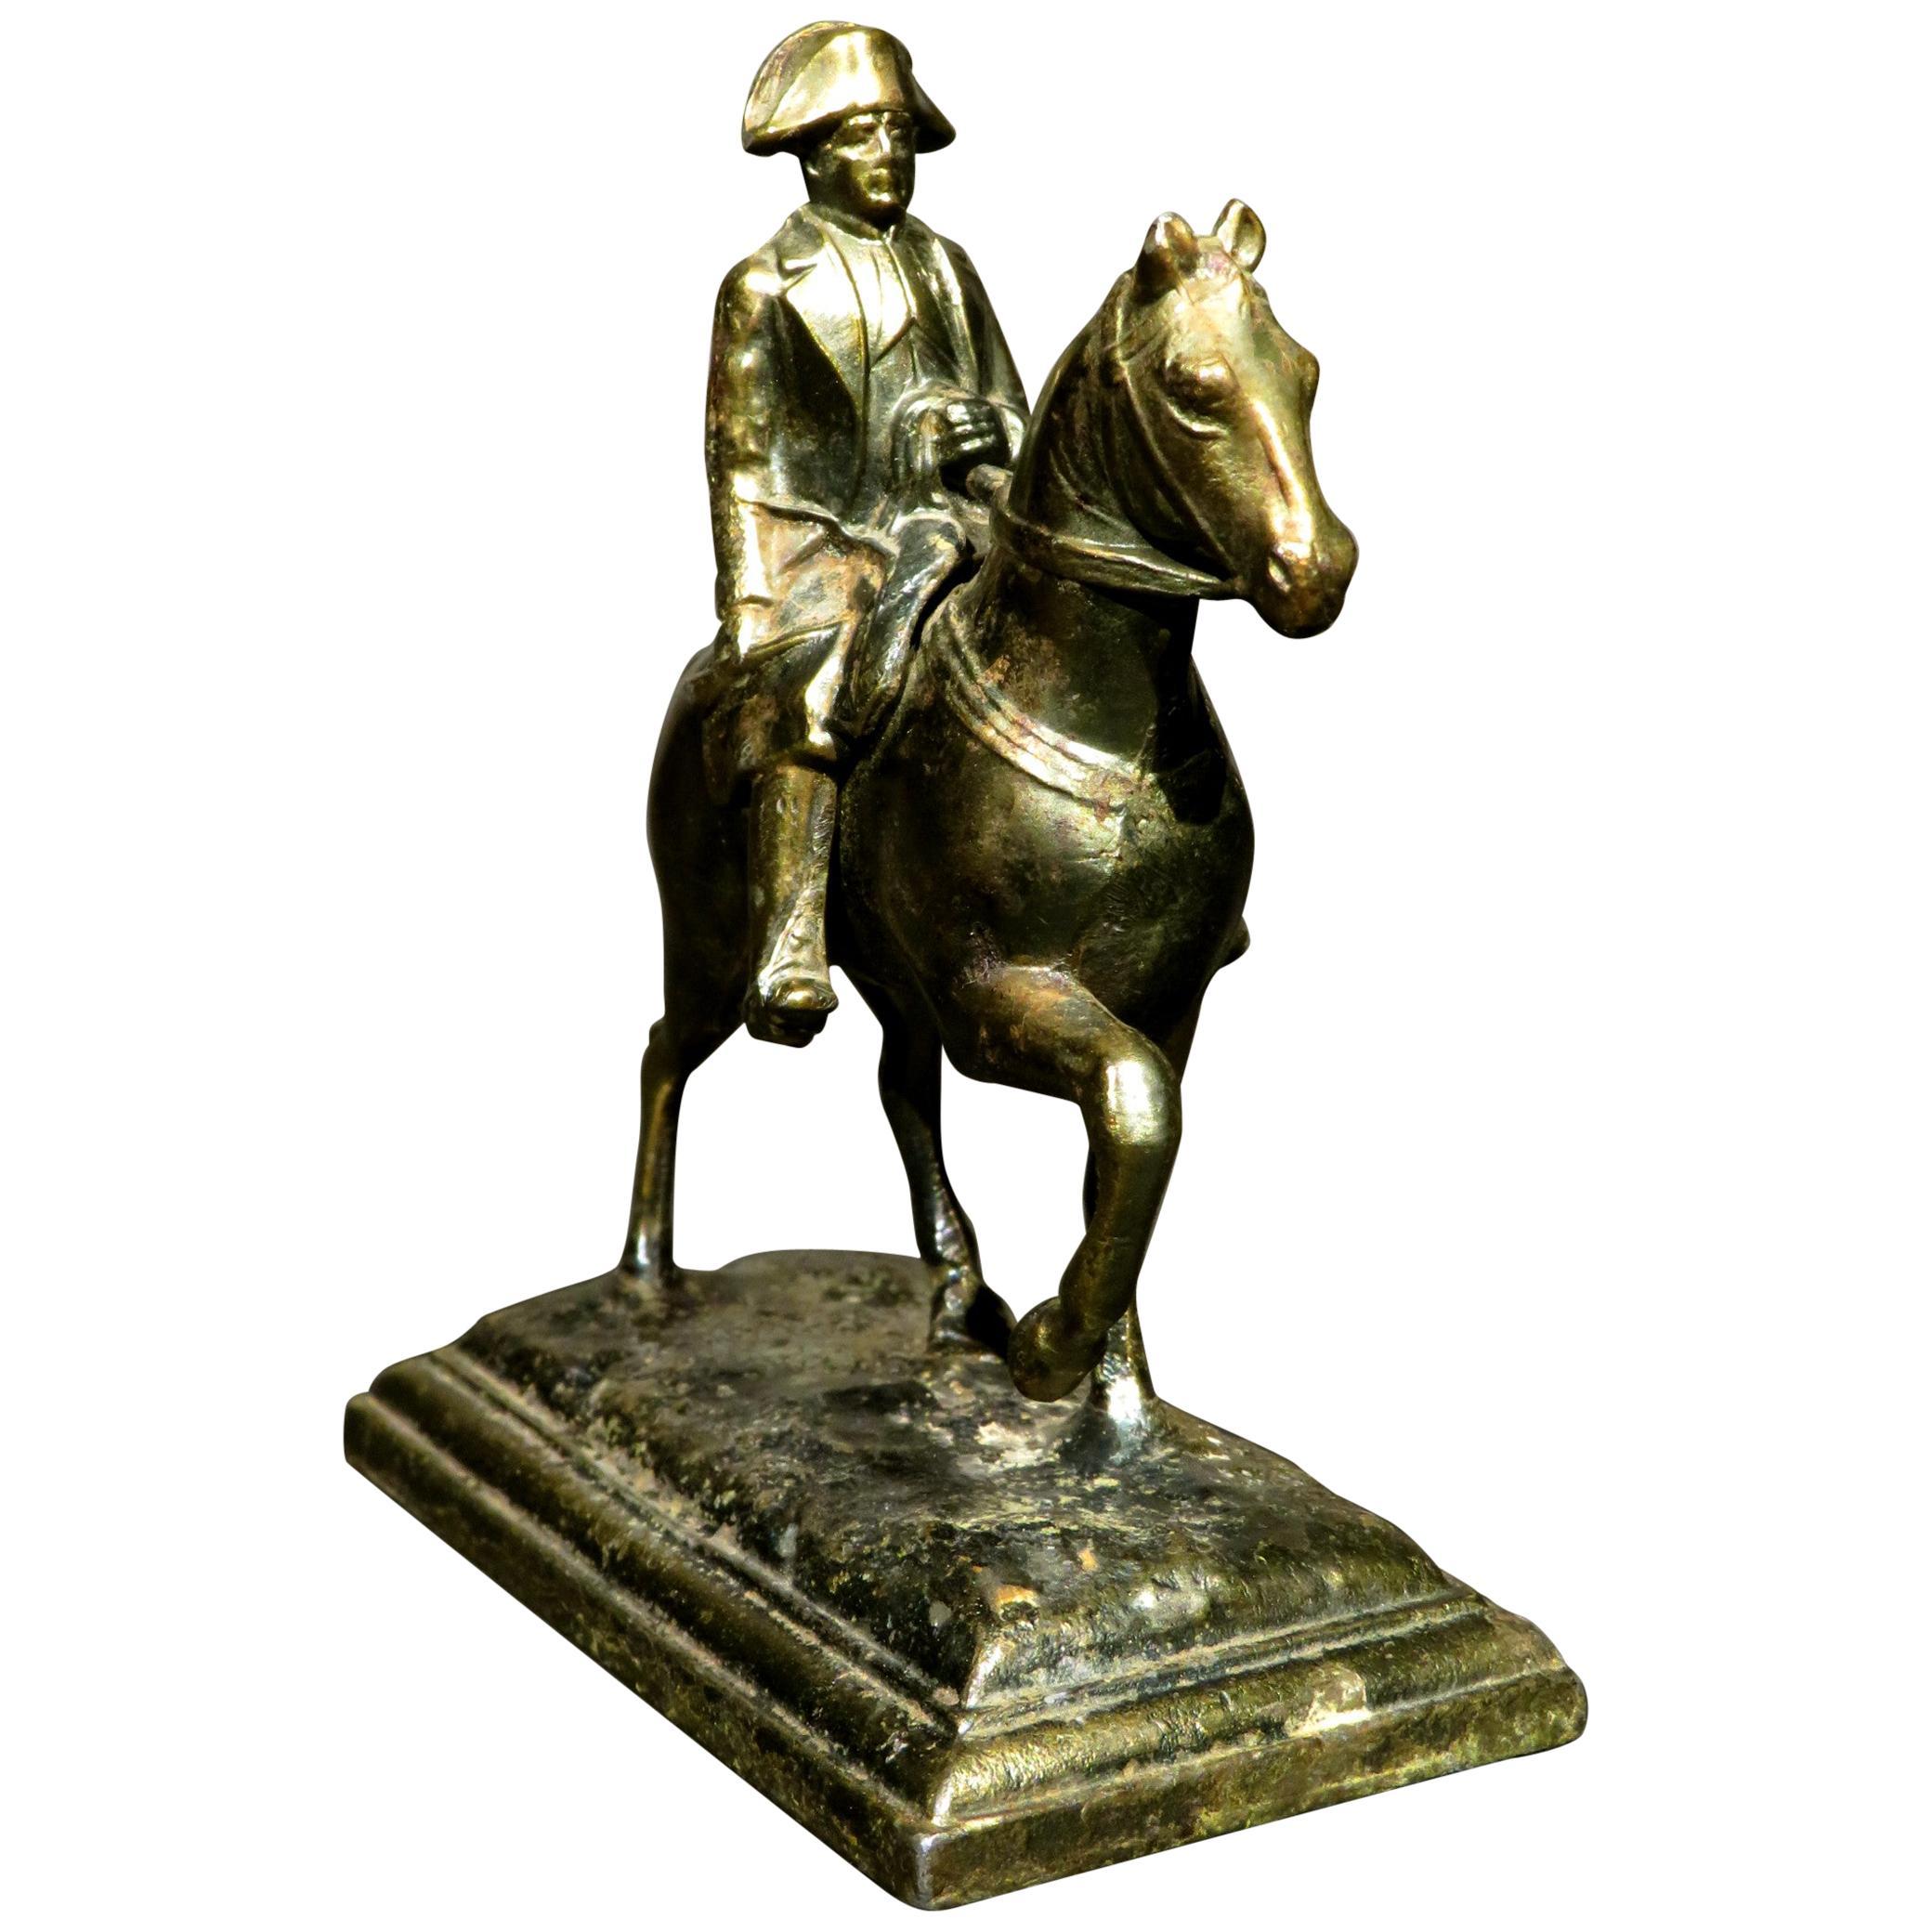 Miniature Patinated Spelter Figure of Napoleon Bonaparte on Horseback